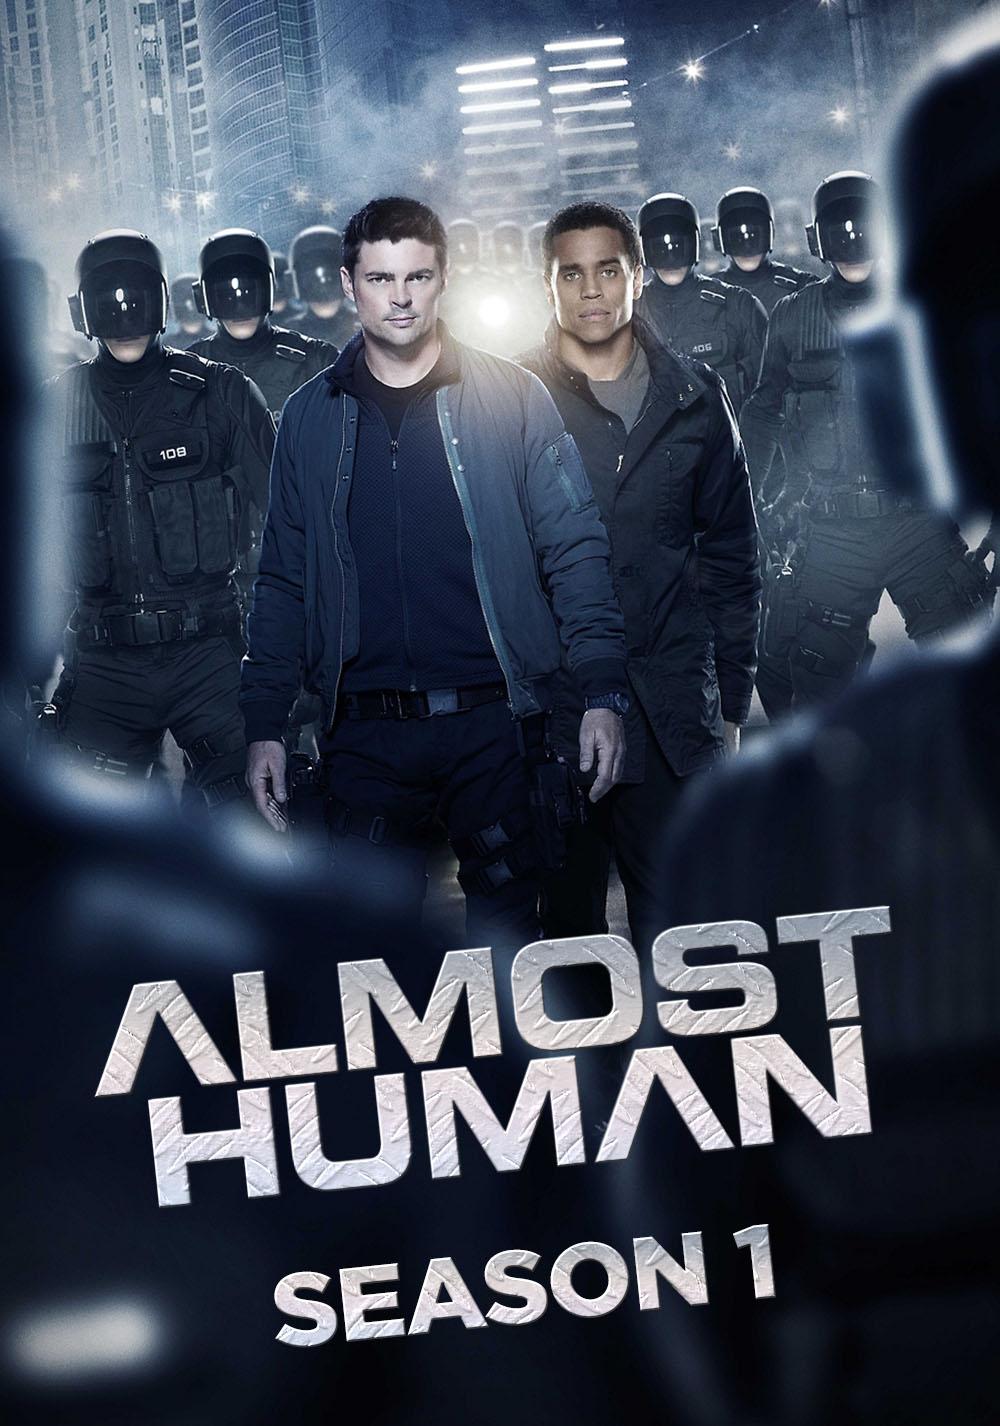 Almost Human | TV Fanart | Fanart.tv